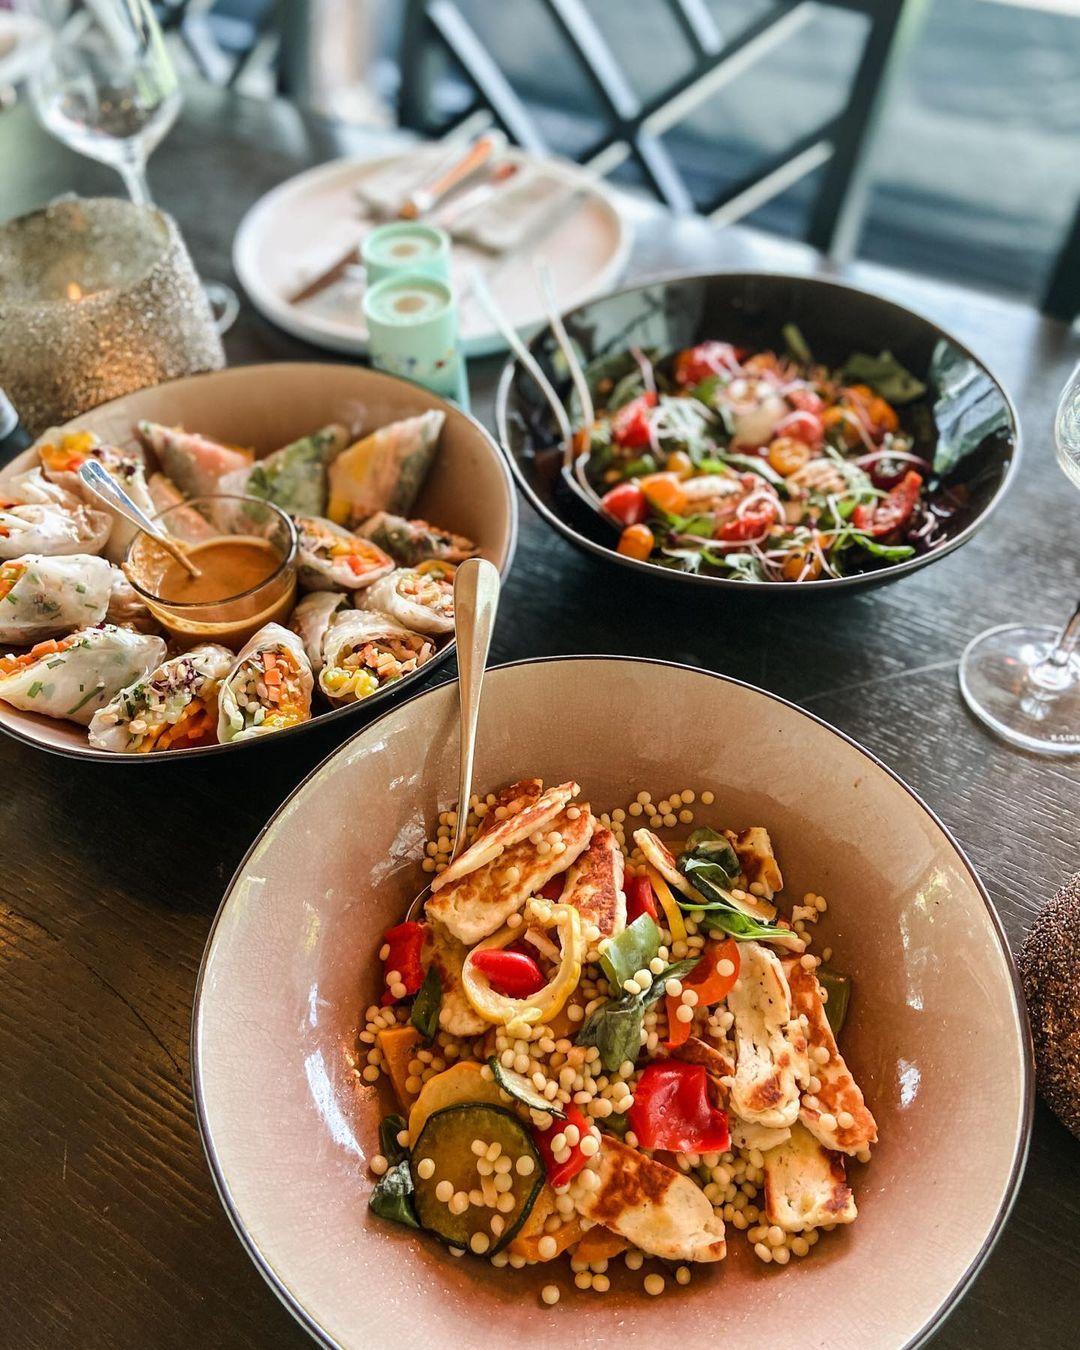 "hmi on Instagram: ""Happy healthy Thursday #autumn #lunch #freshfood #eatyourveggies #haloumisalad #springrollsforlife #delisalad #saldeibiza #hmi…"""